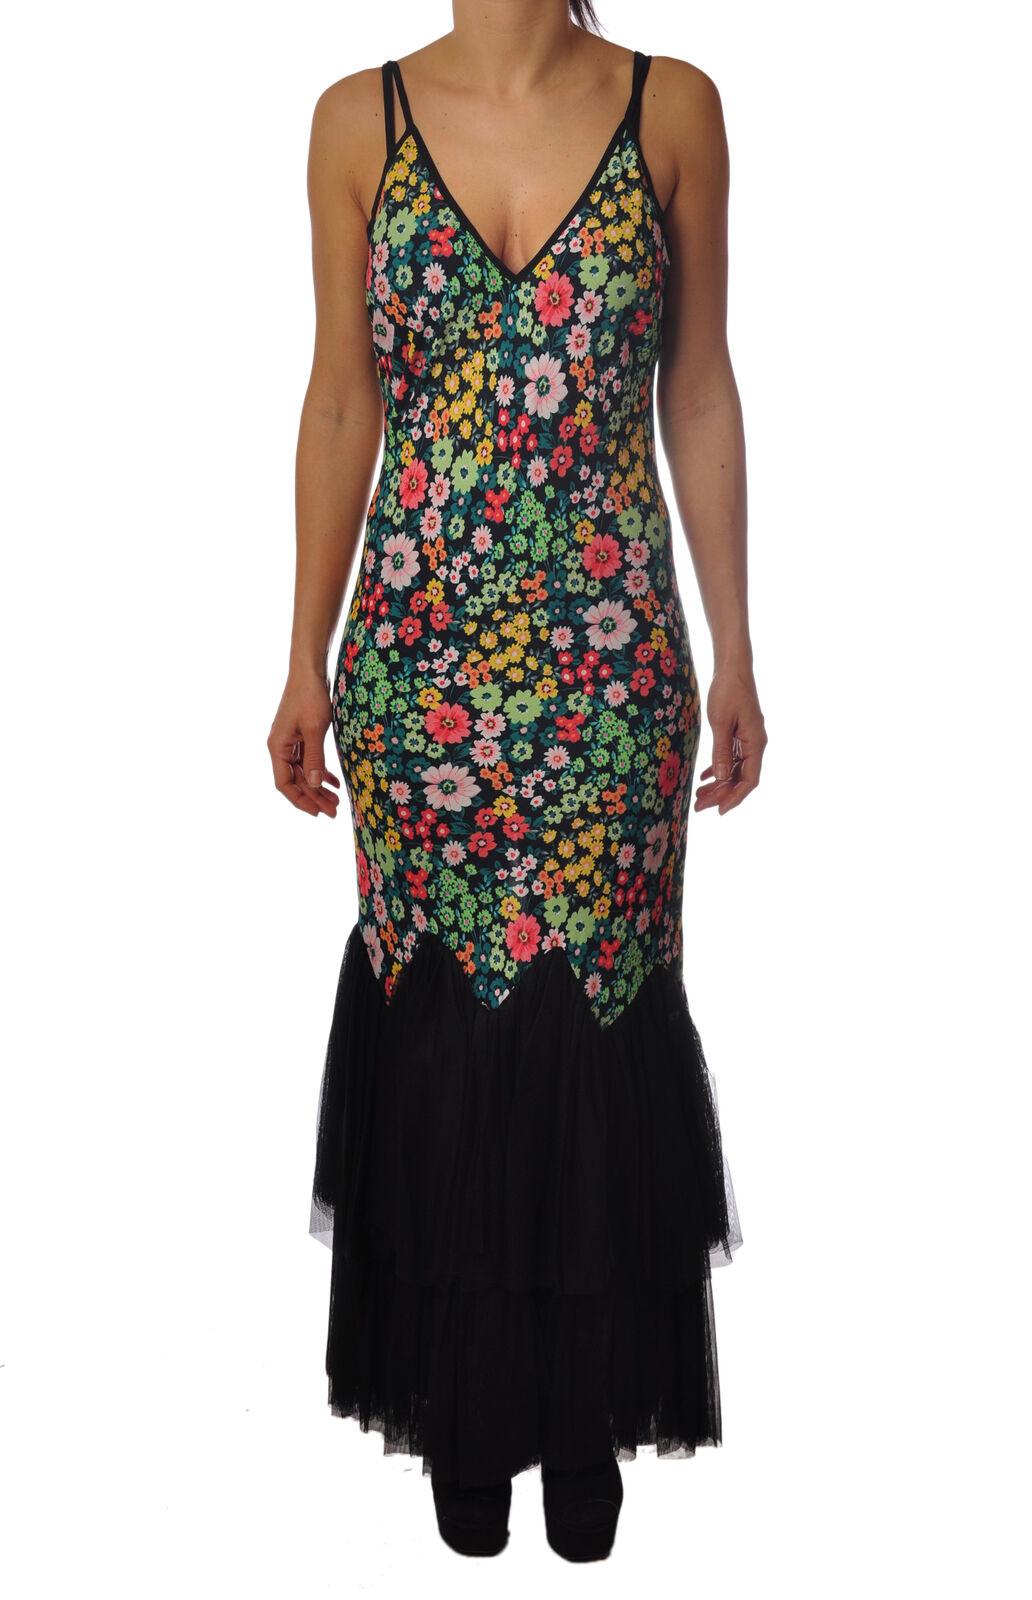 Ottod'ame - Dresses-Dress - Woman - Fantasy - 4945511D183856